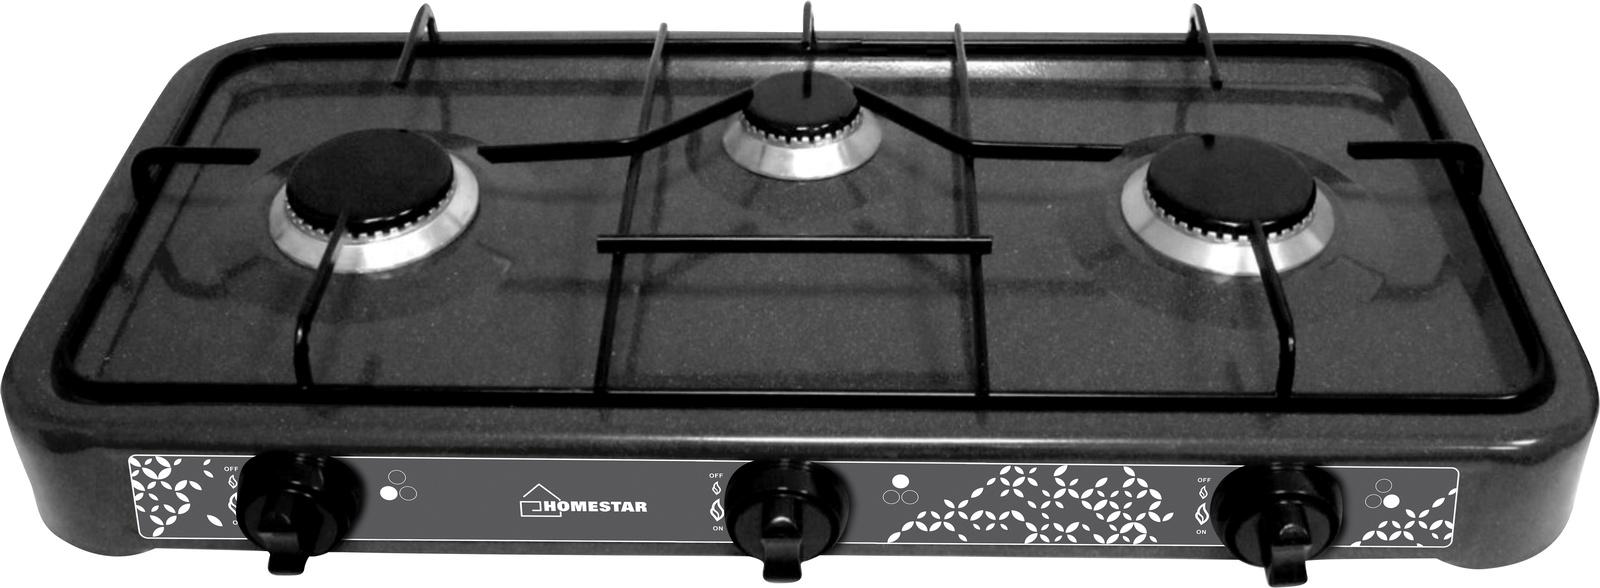 лучшая цена Настольная плита HOMESTAR HS-1203, 54 003700, черный